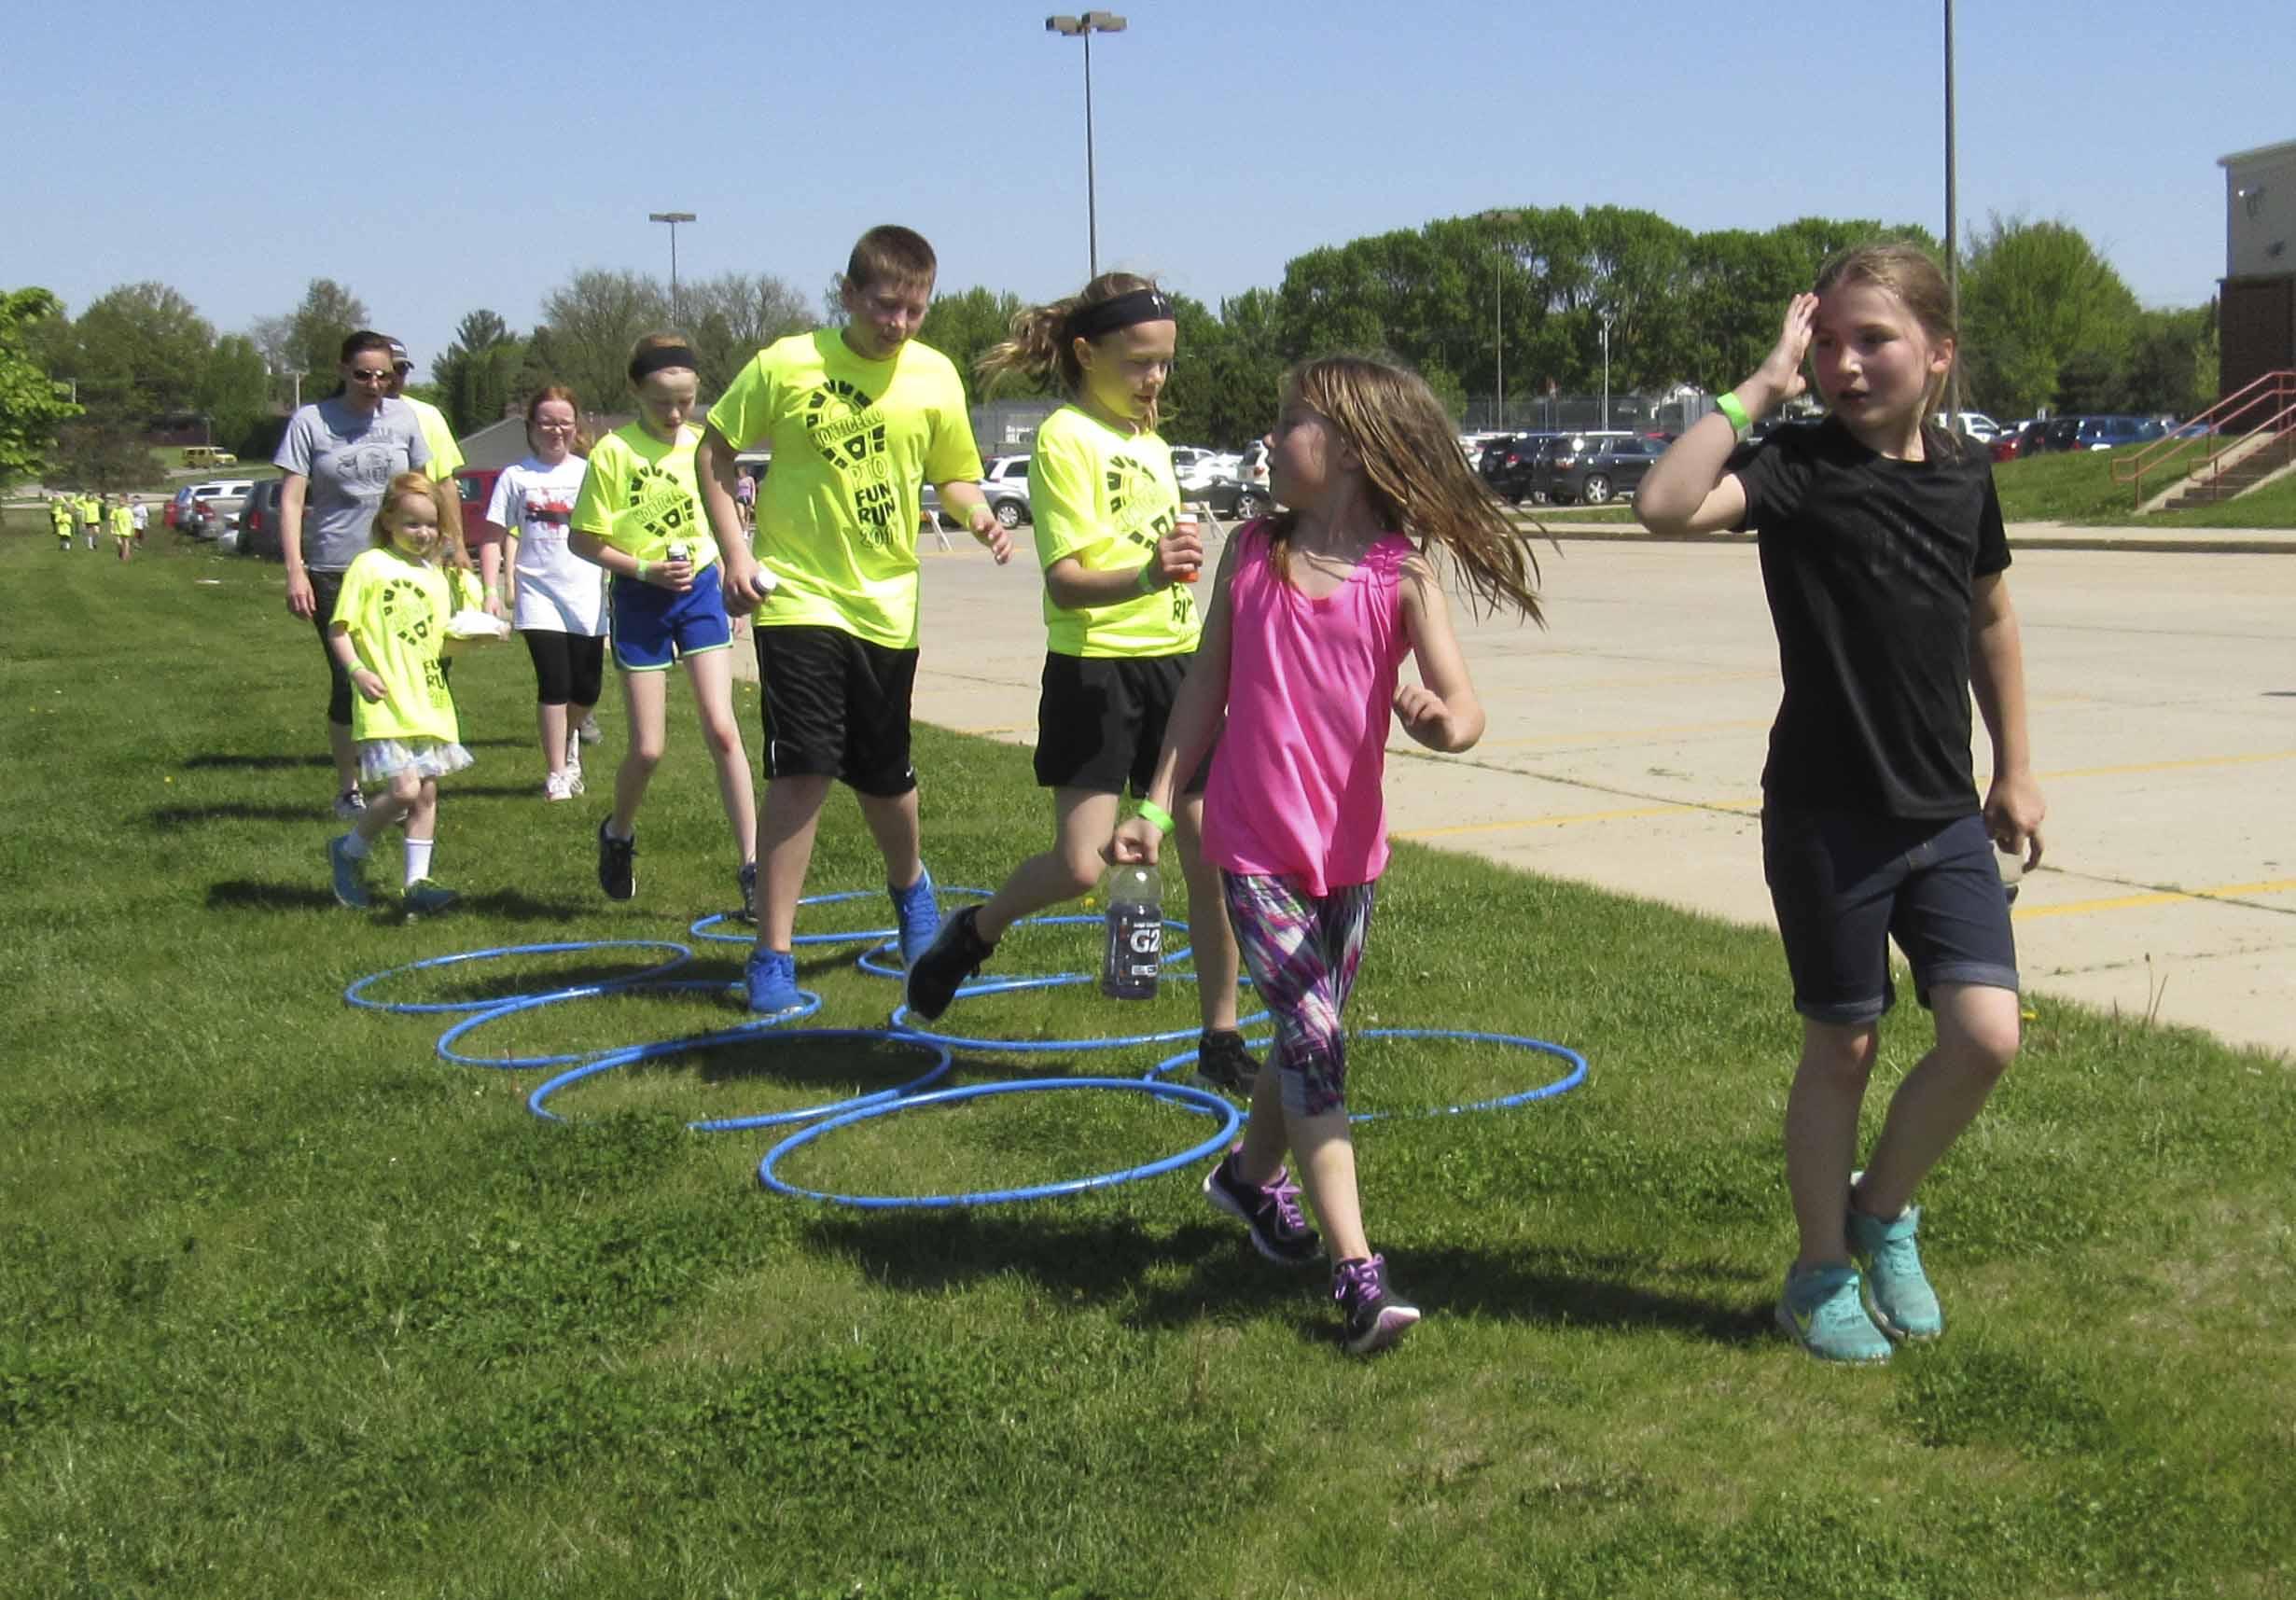 Kids jump through the final hula-hoop hurdle at the PTO Fun Run, May 13. After the run, families enjoyed a dance party and food.